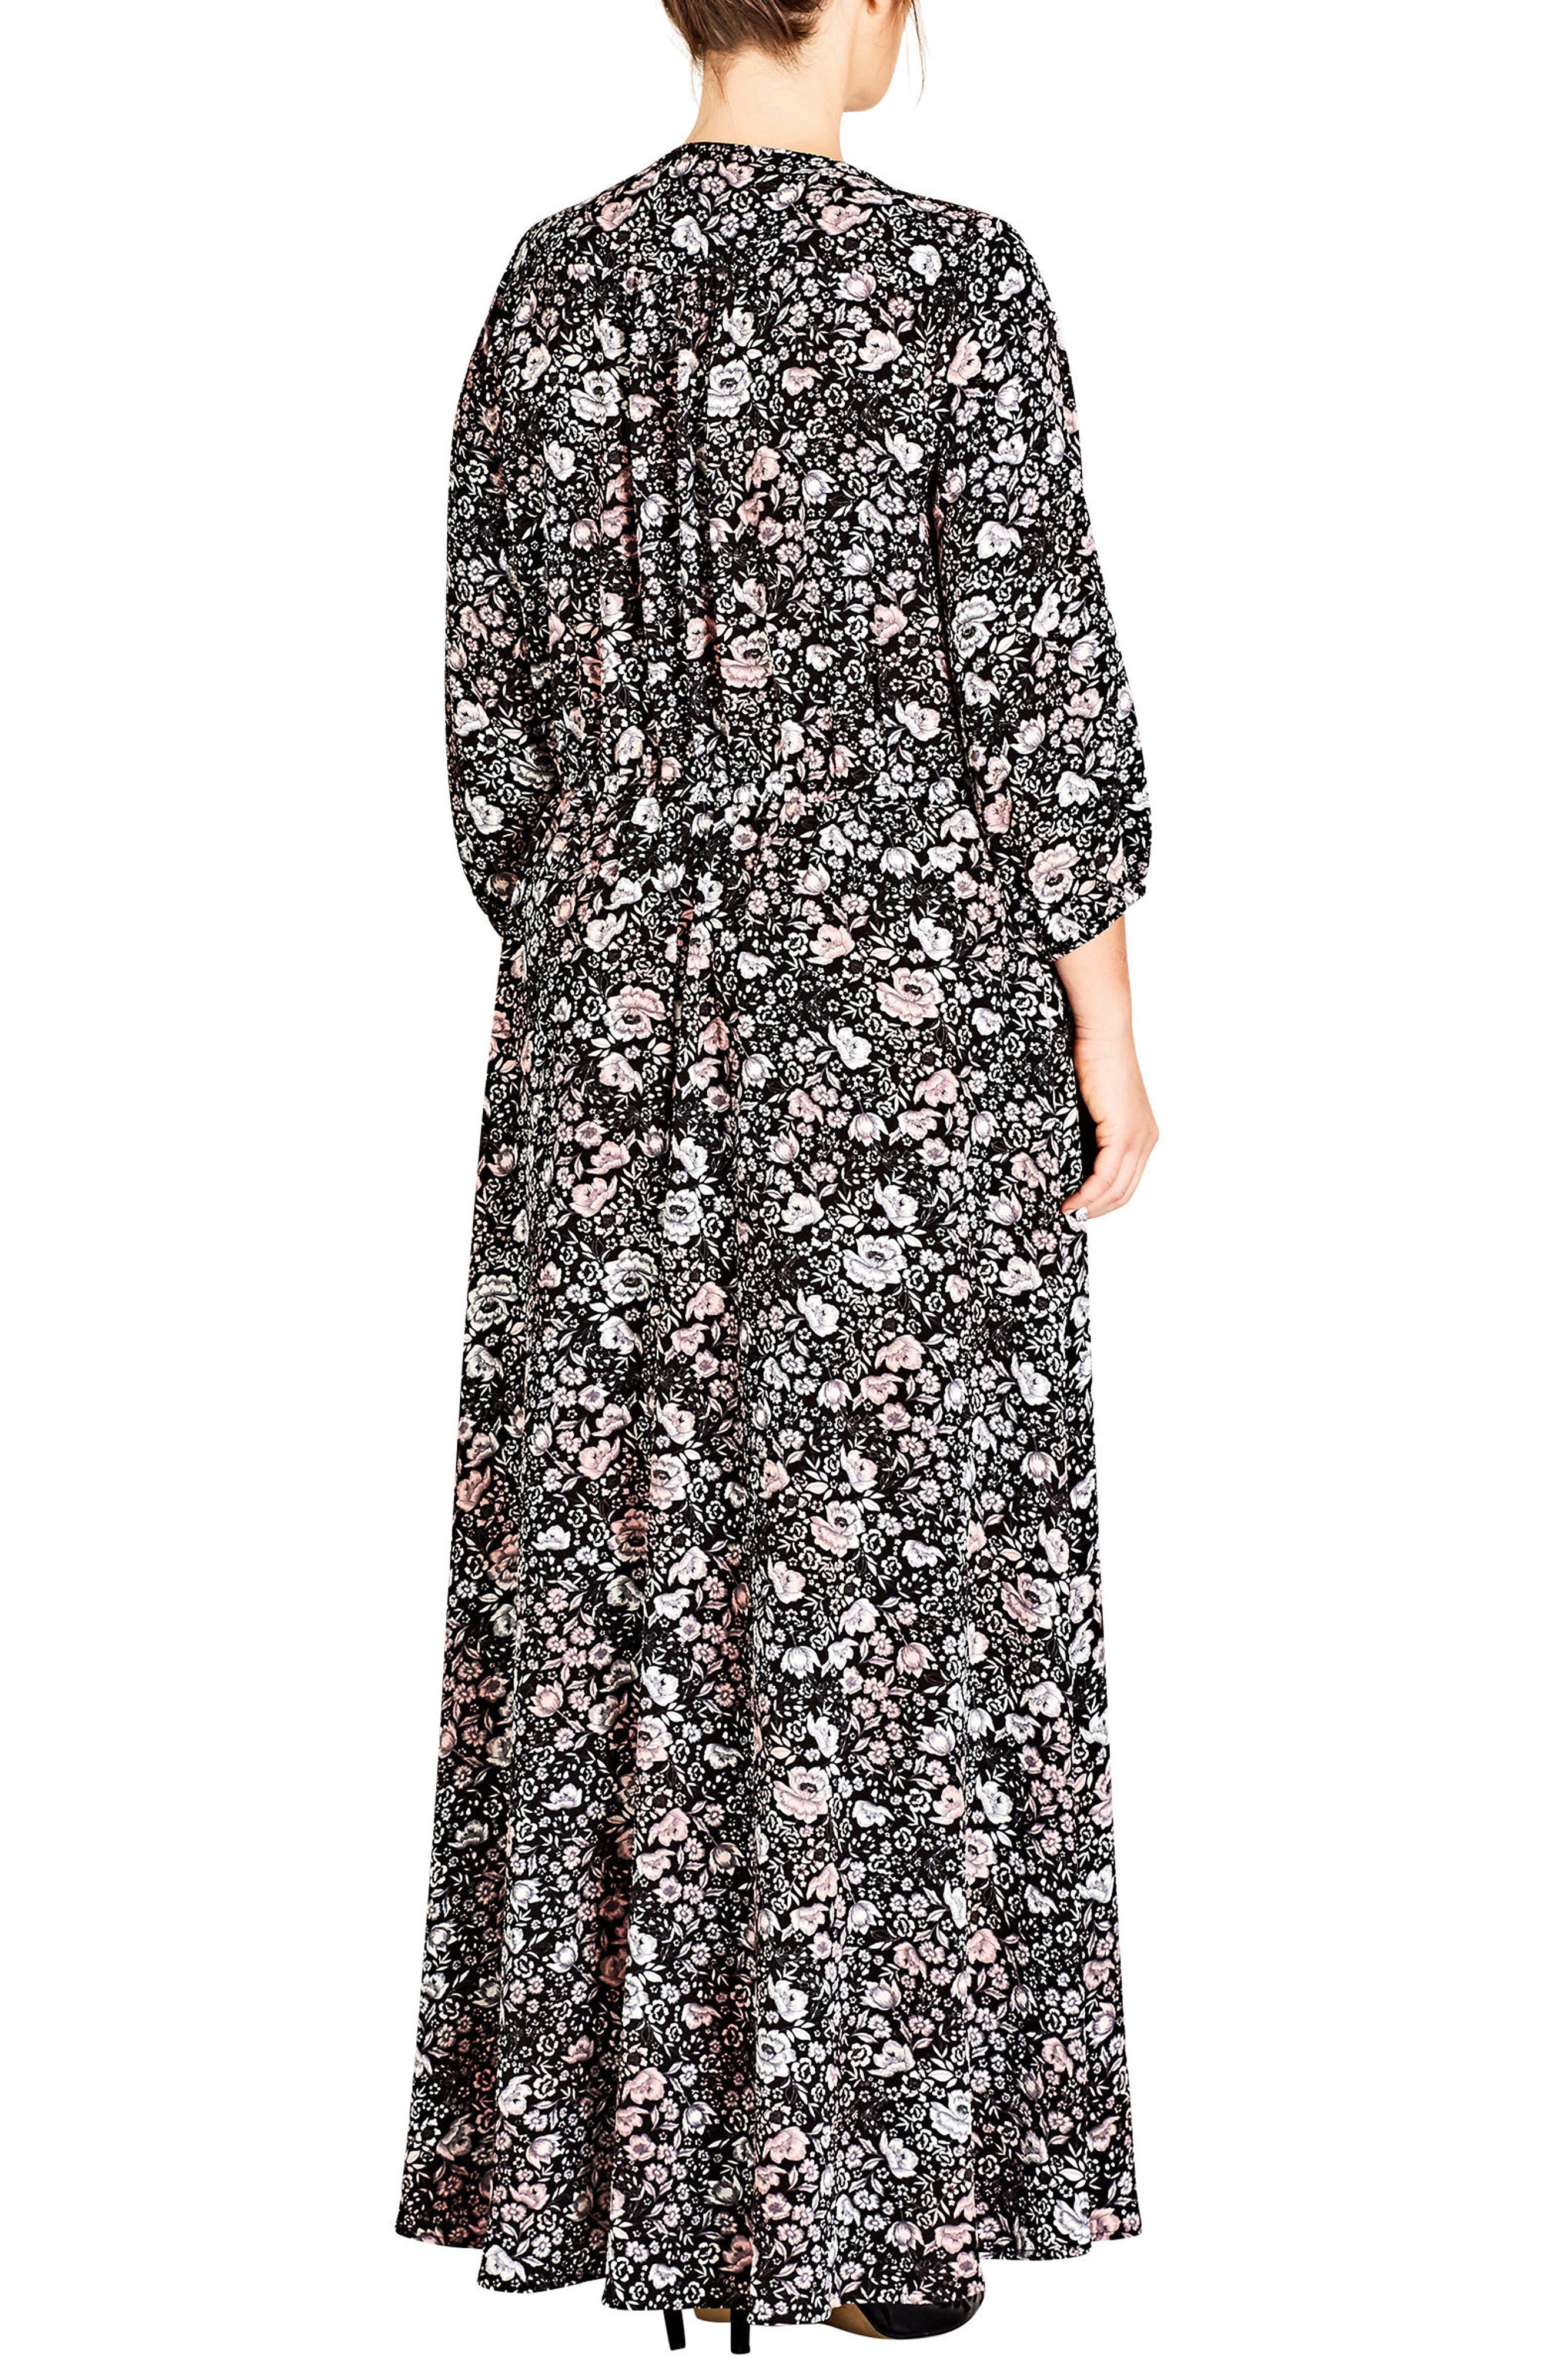 Etched Floral Maxi Dress,                             Alternate thumbnail 2, color,                             Etched Floral